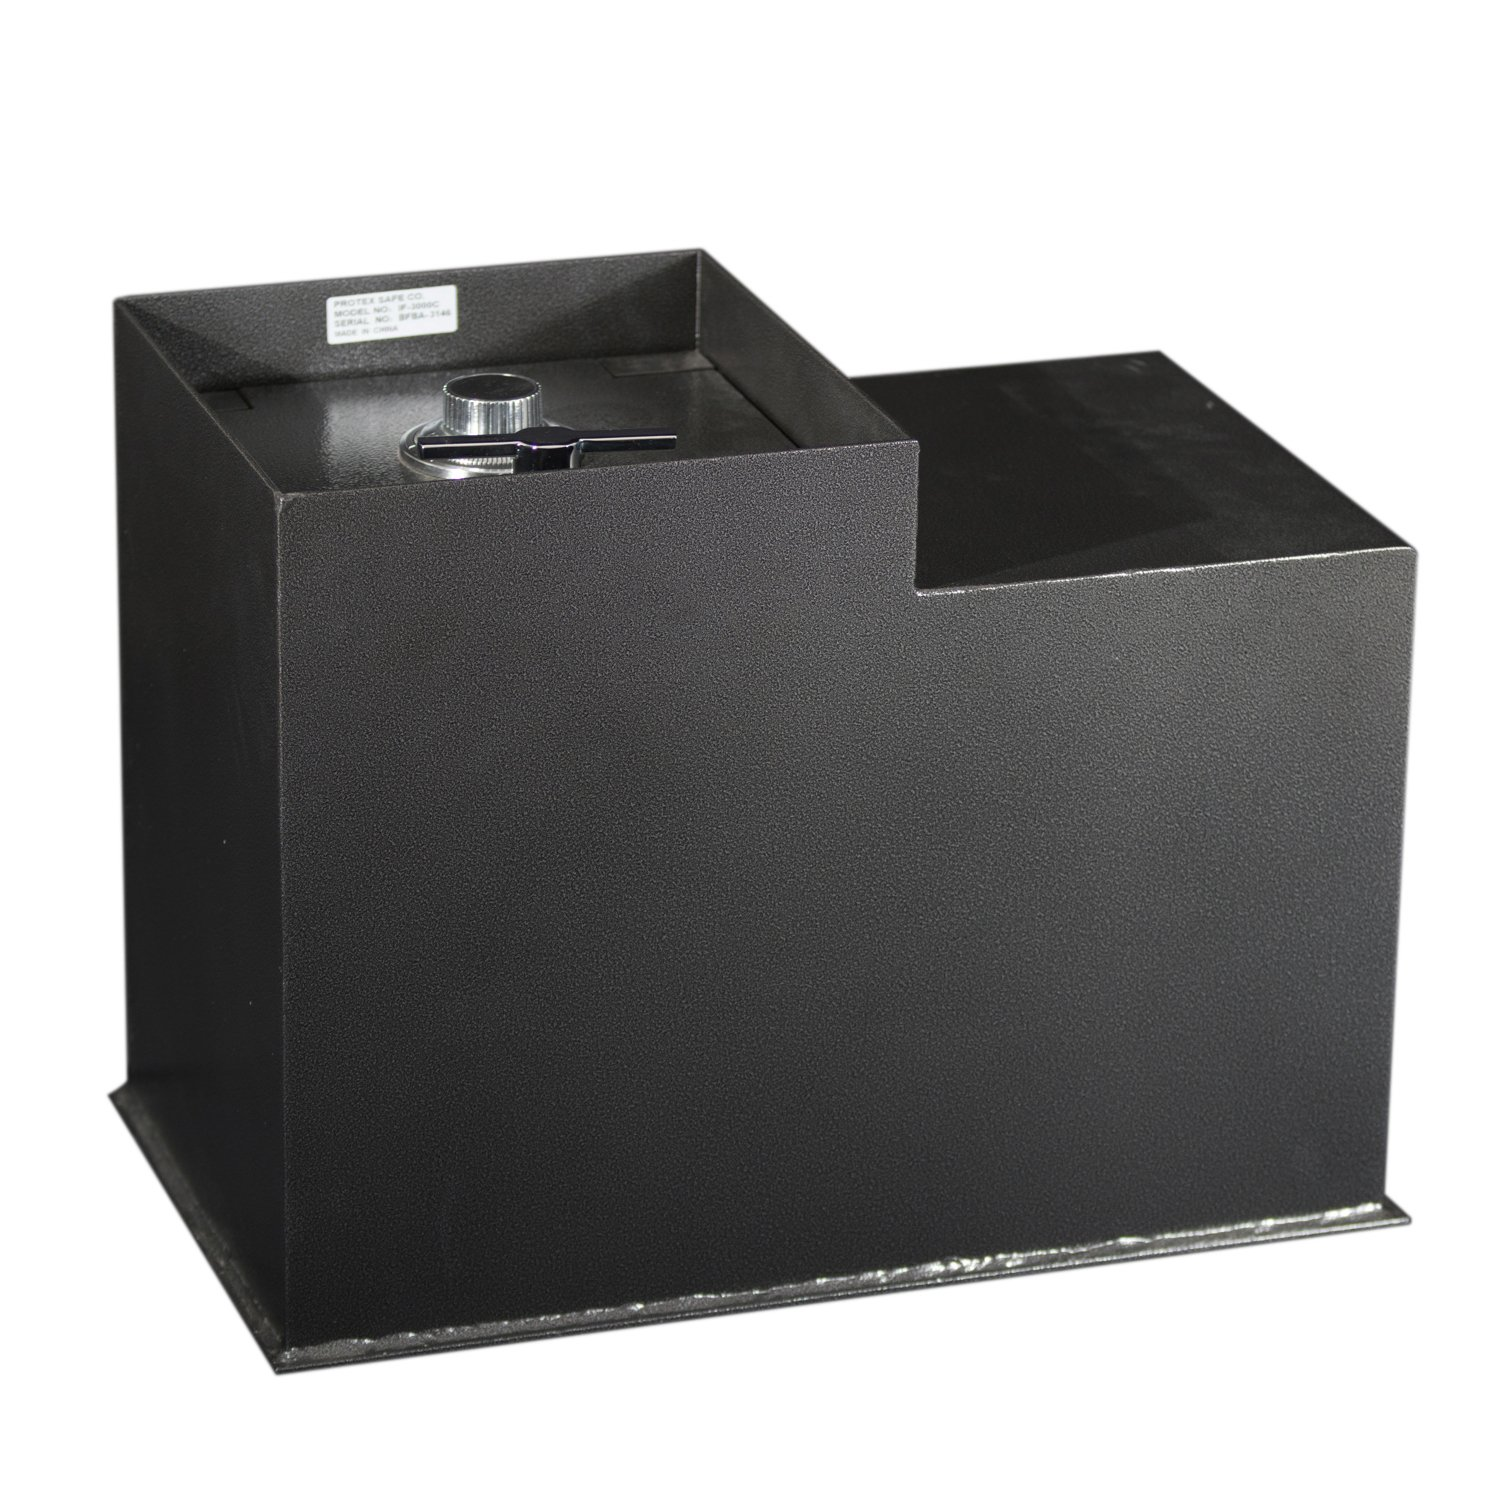 Protex IF-3000C Floor Safe, XL, Gray